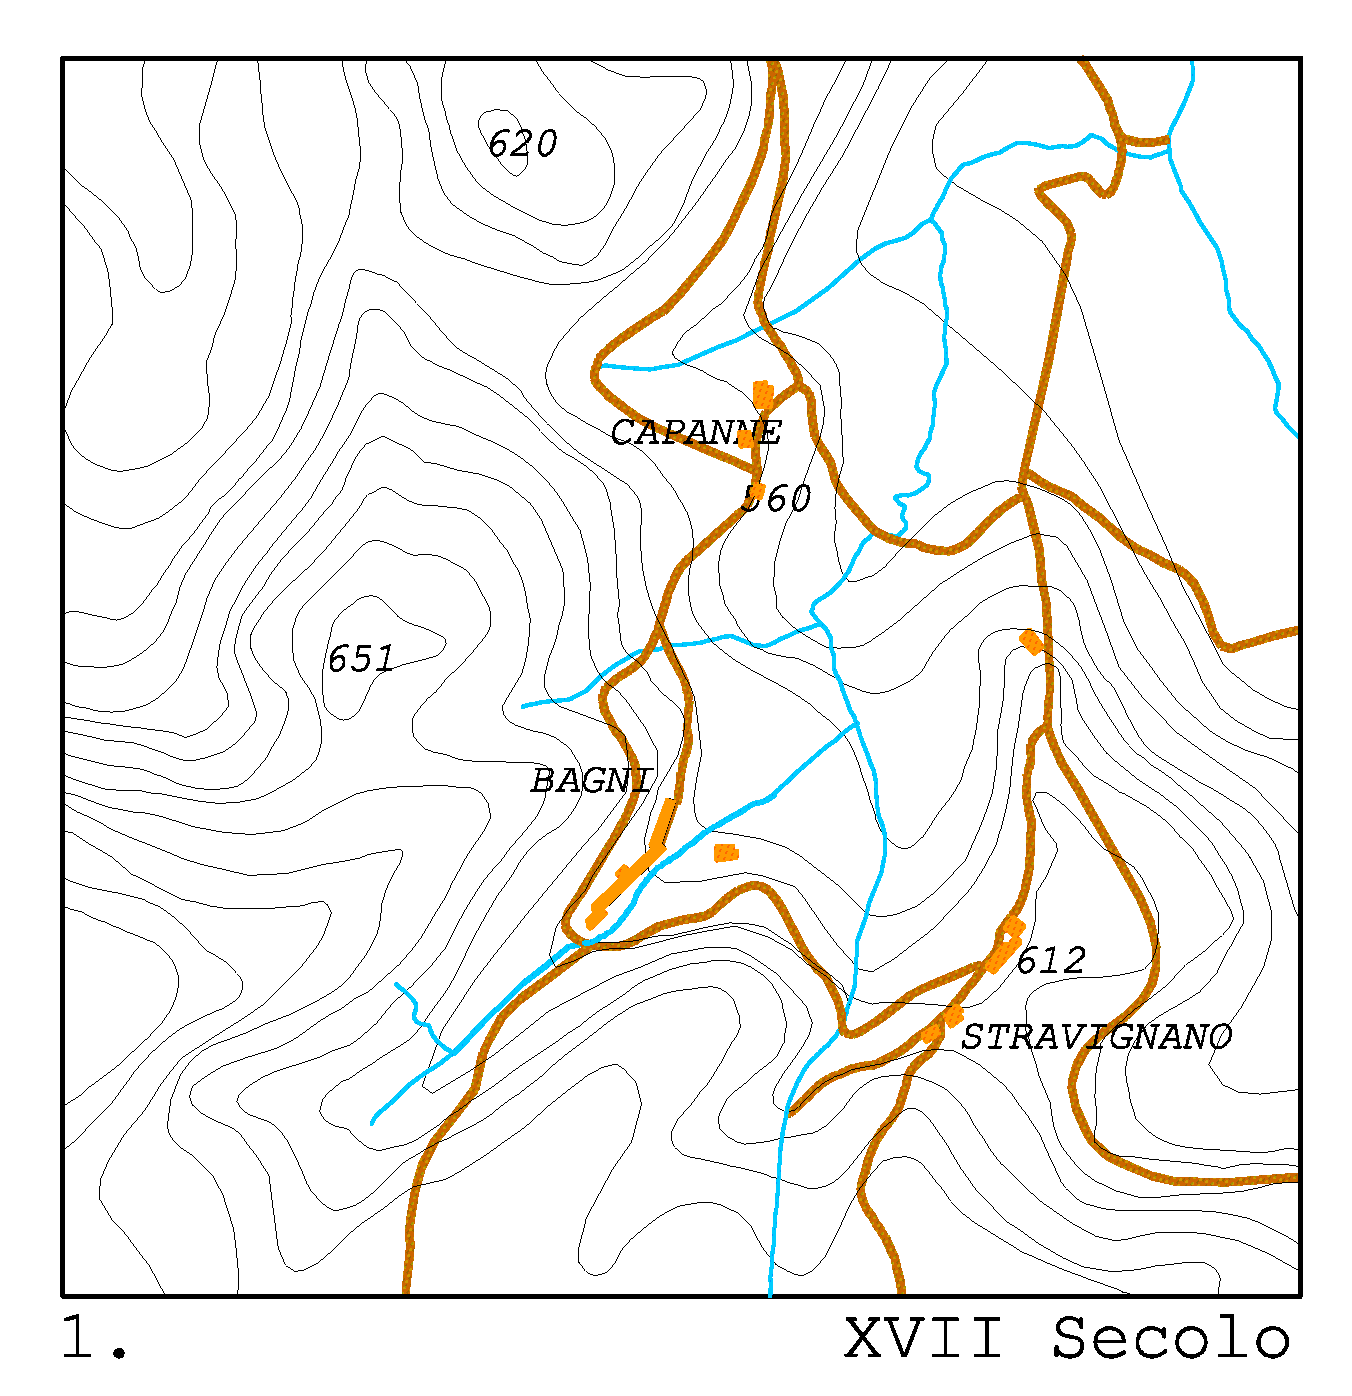 File:Bagni XVII.PNG - Wikimedia Commons